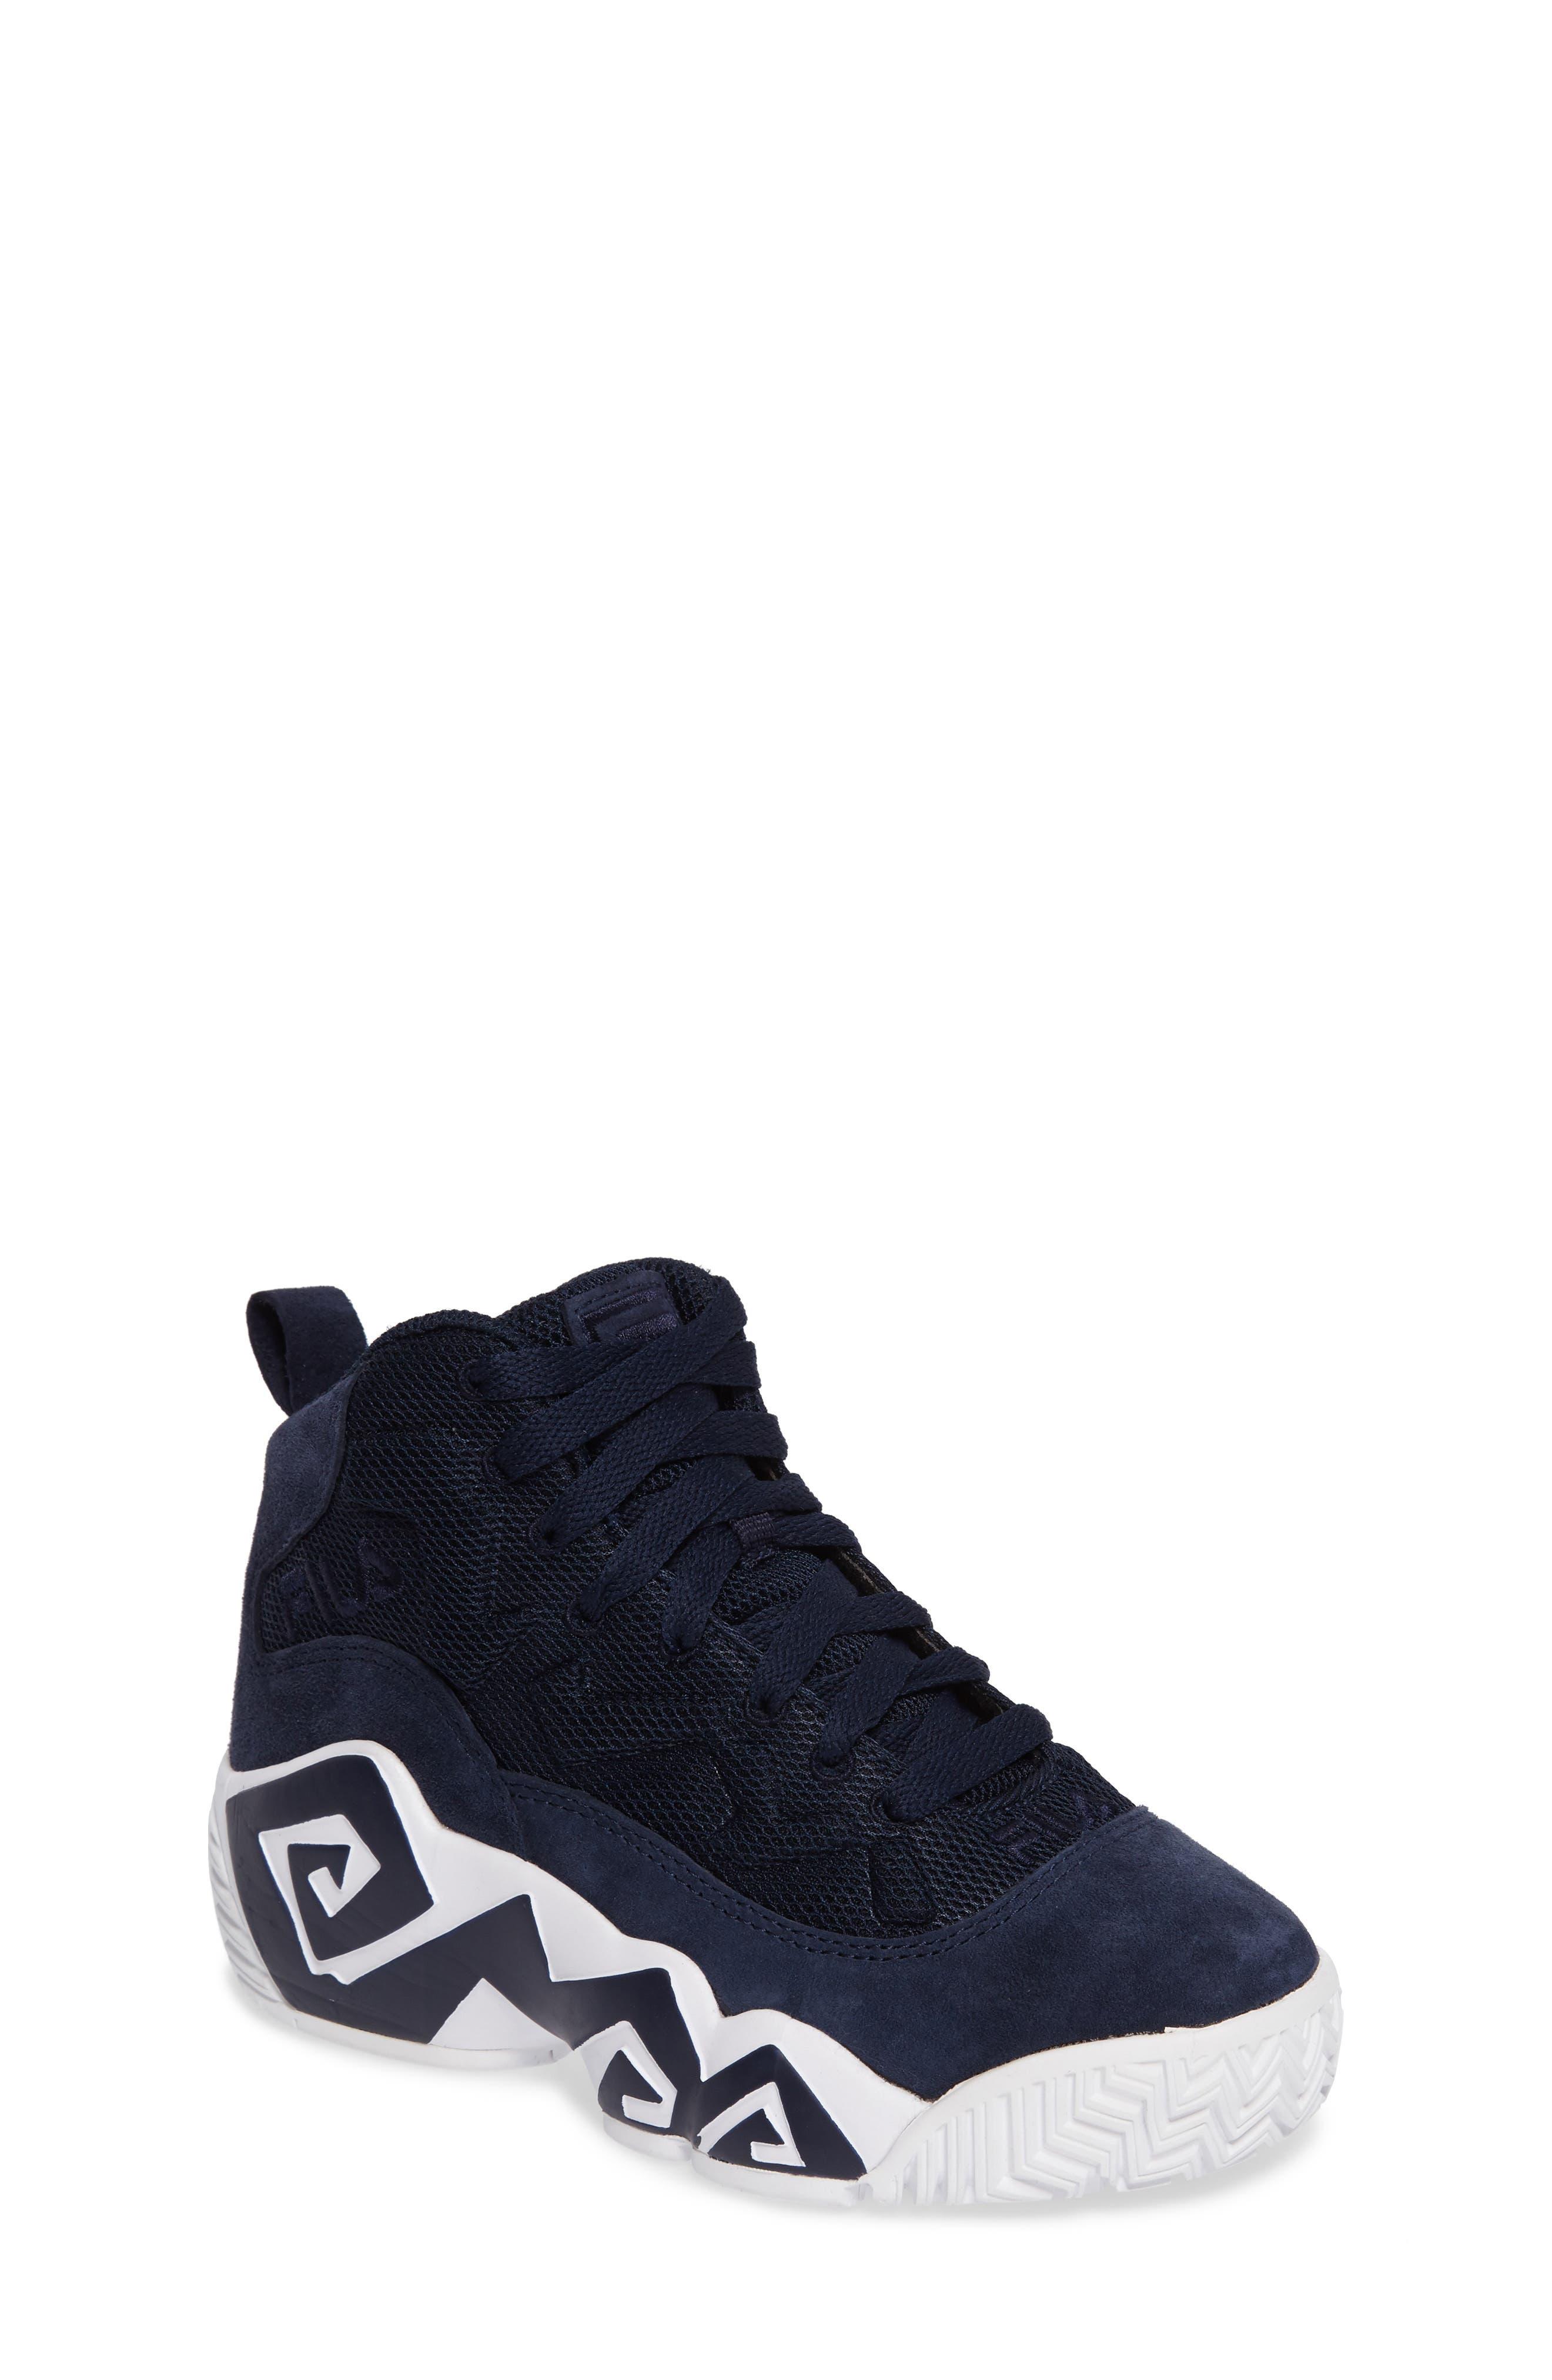 FILA MB Mesh Sneaker (Big Kid)